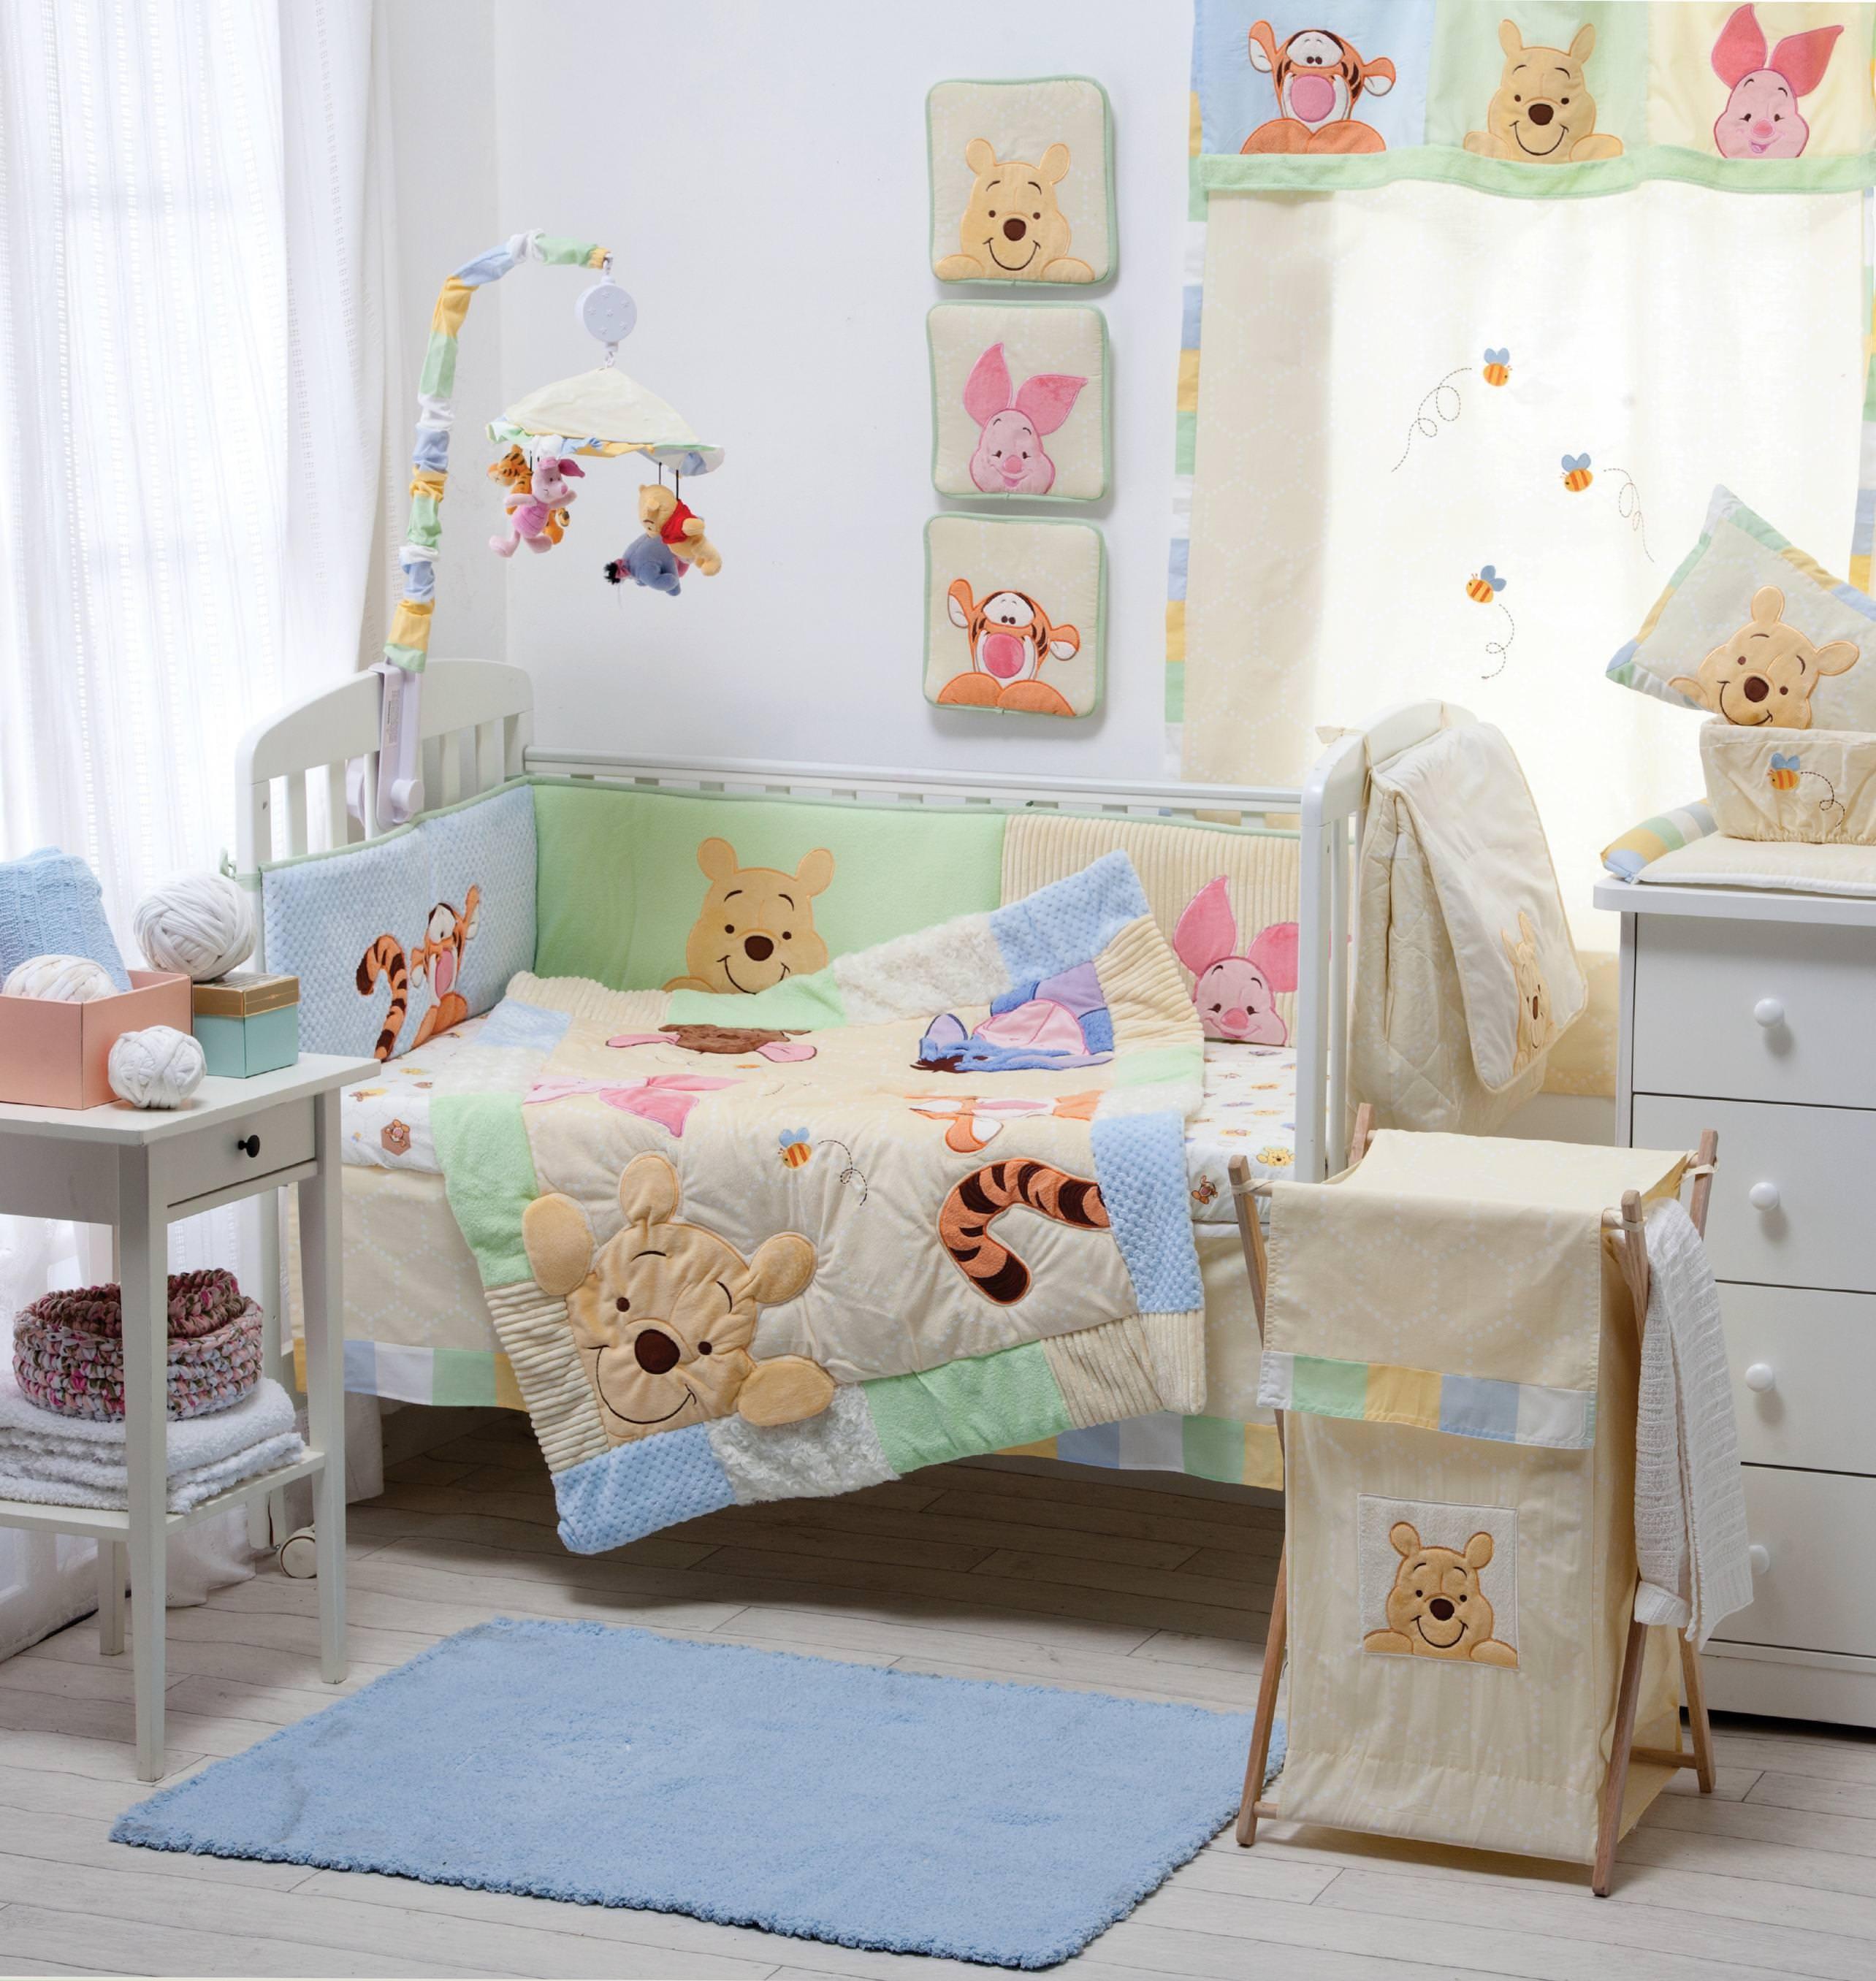 Baby Bedding Sets Hiding Pooh Crib Collection 4 Pc Set Nursery